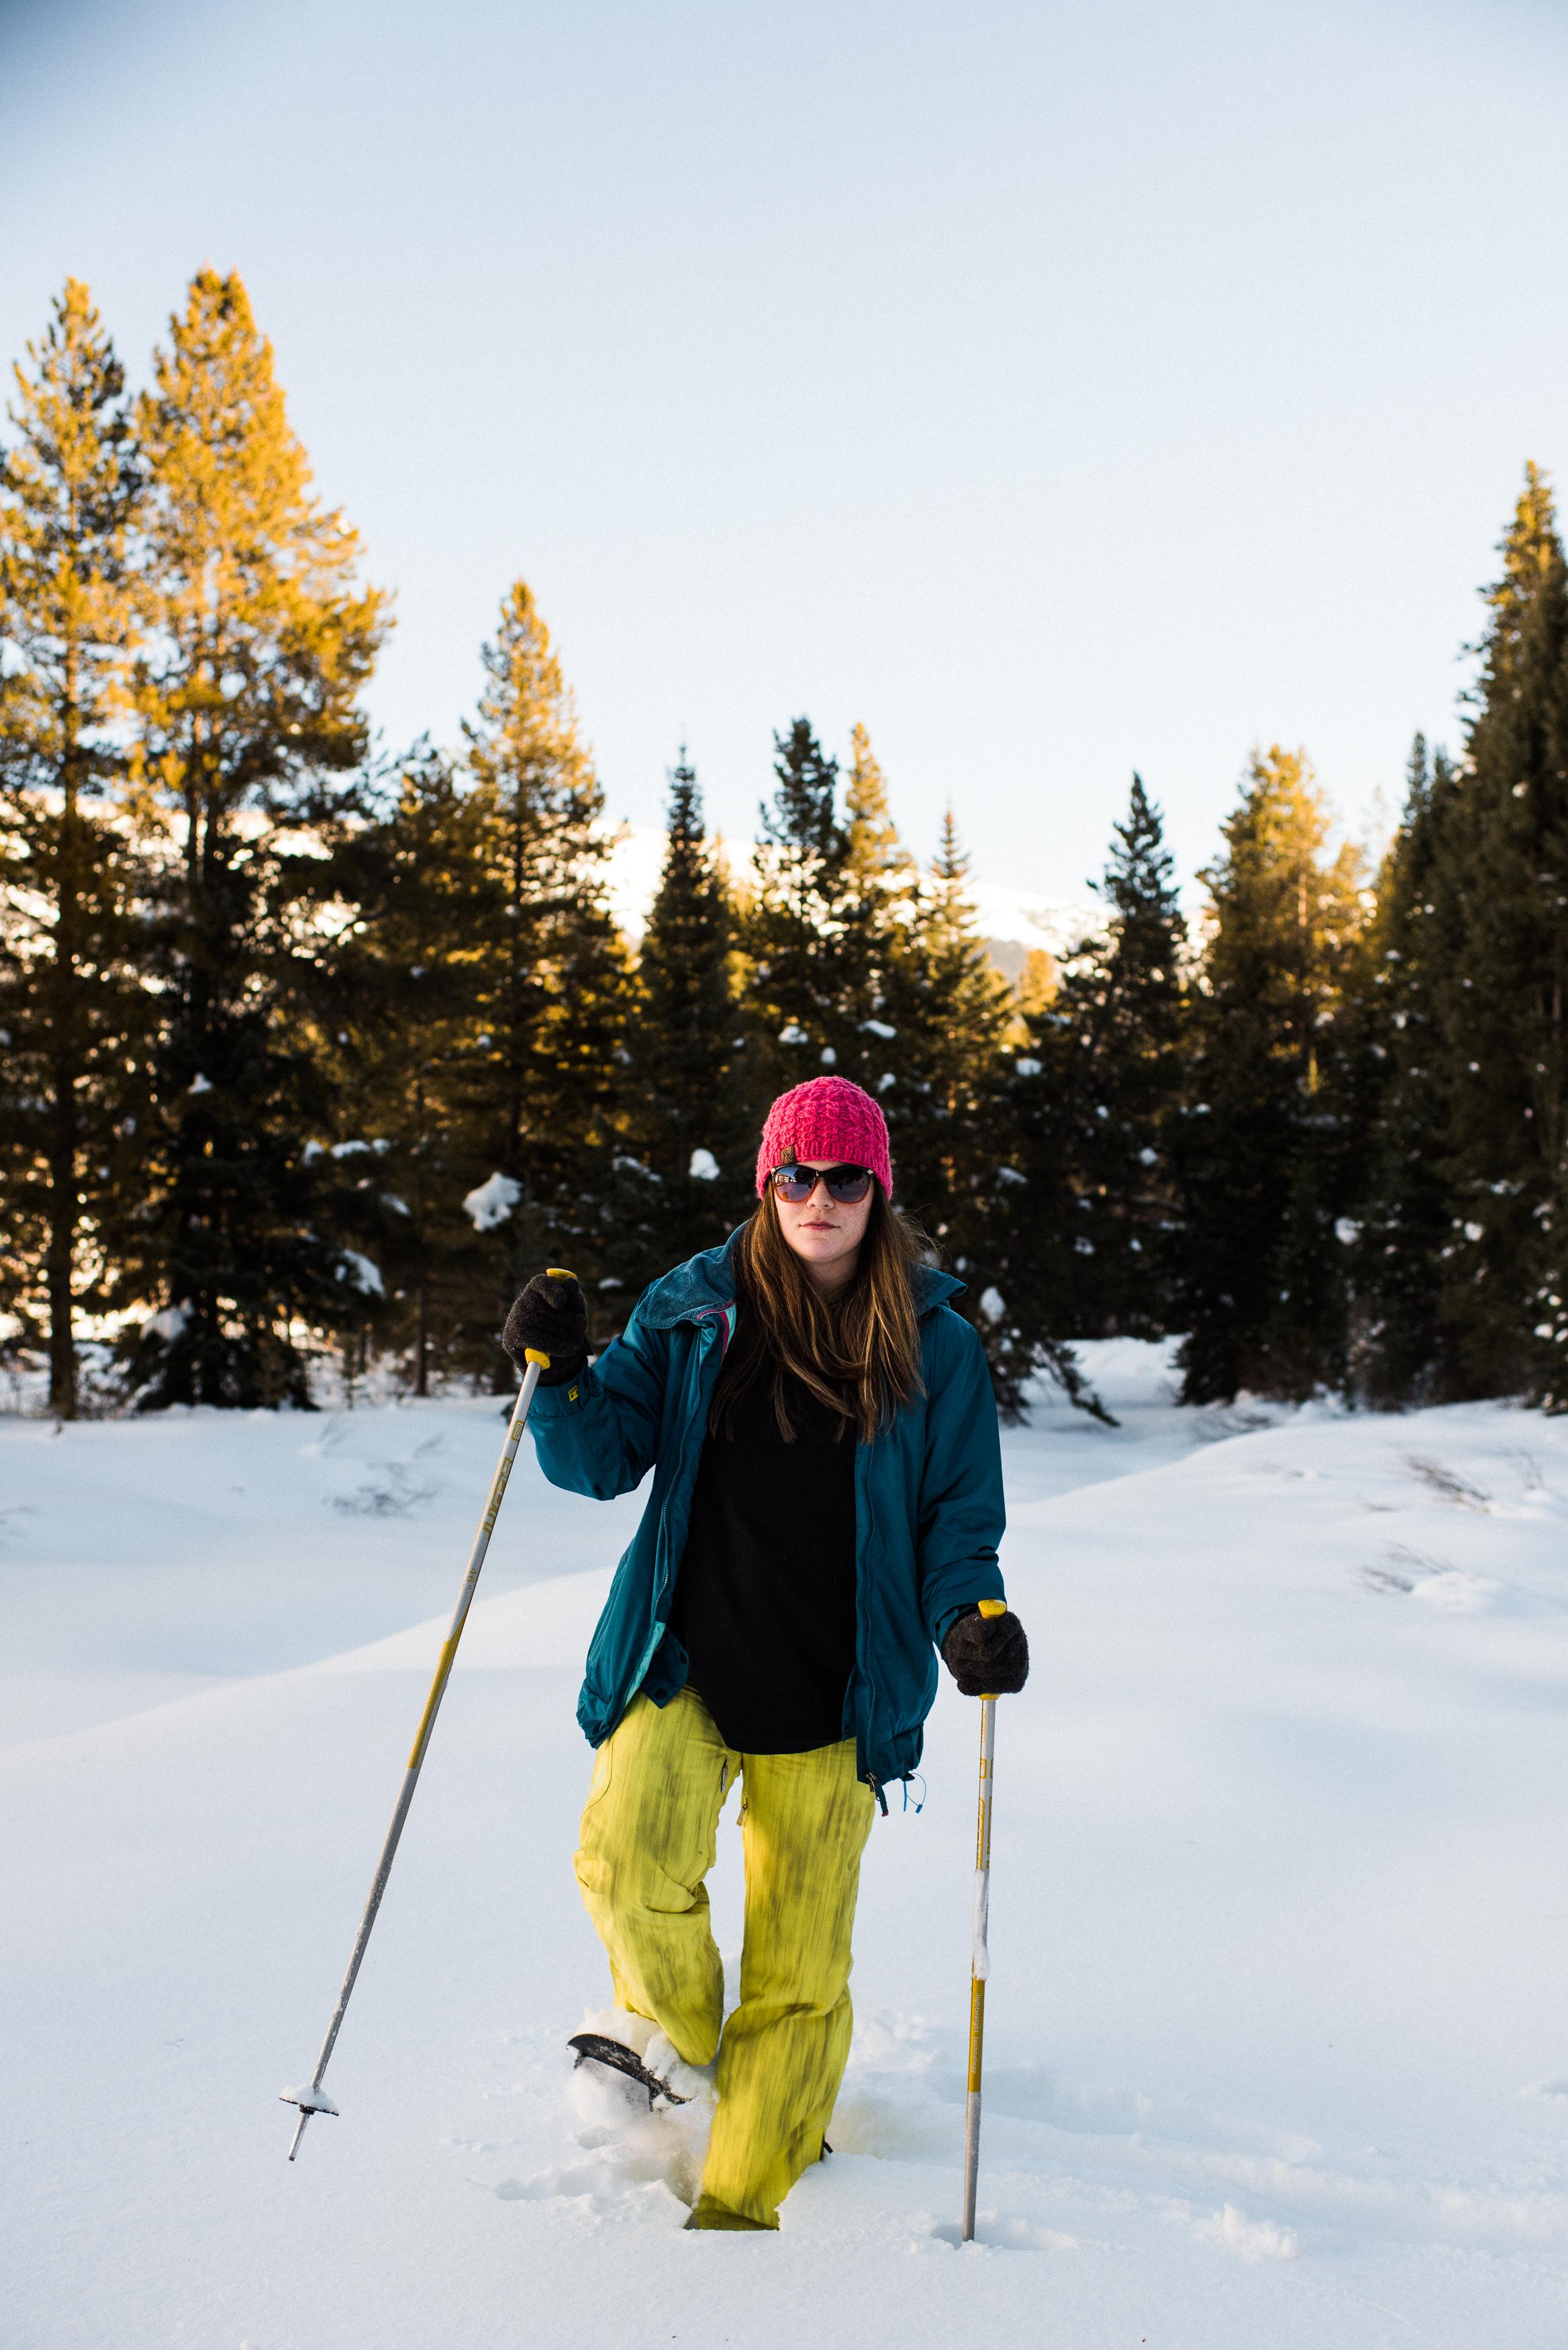 TaraShupe_Outdoor_Photographer_Loweprobags_Colorado_Copper_Mountains_Ski_77.jpg